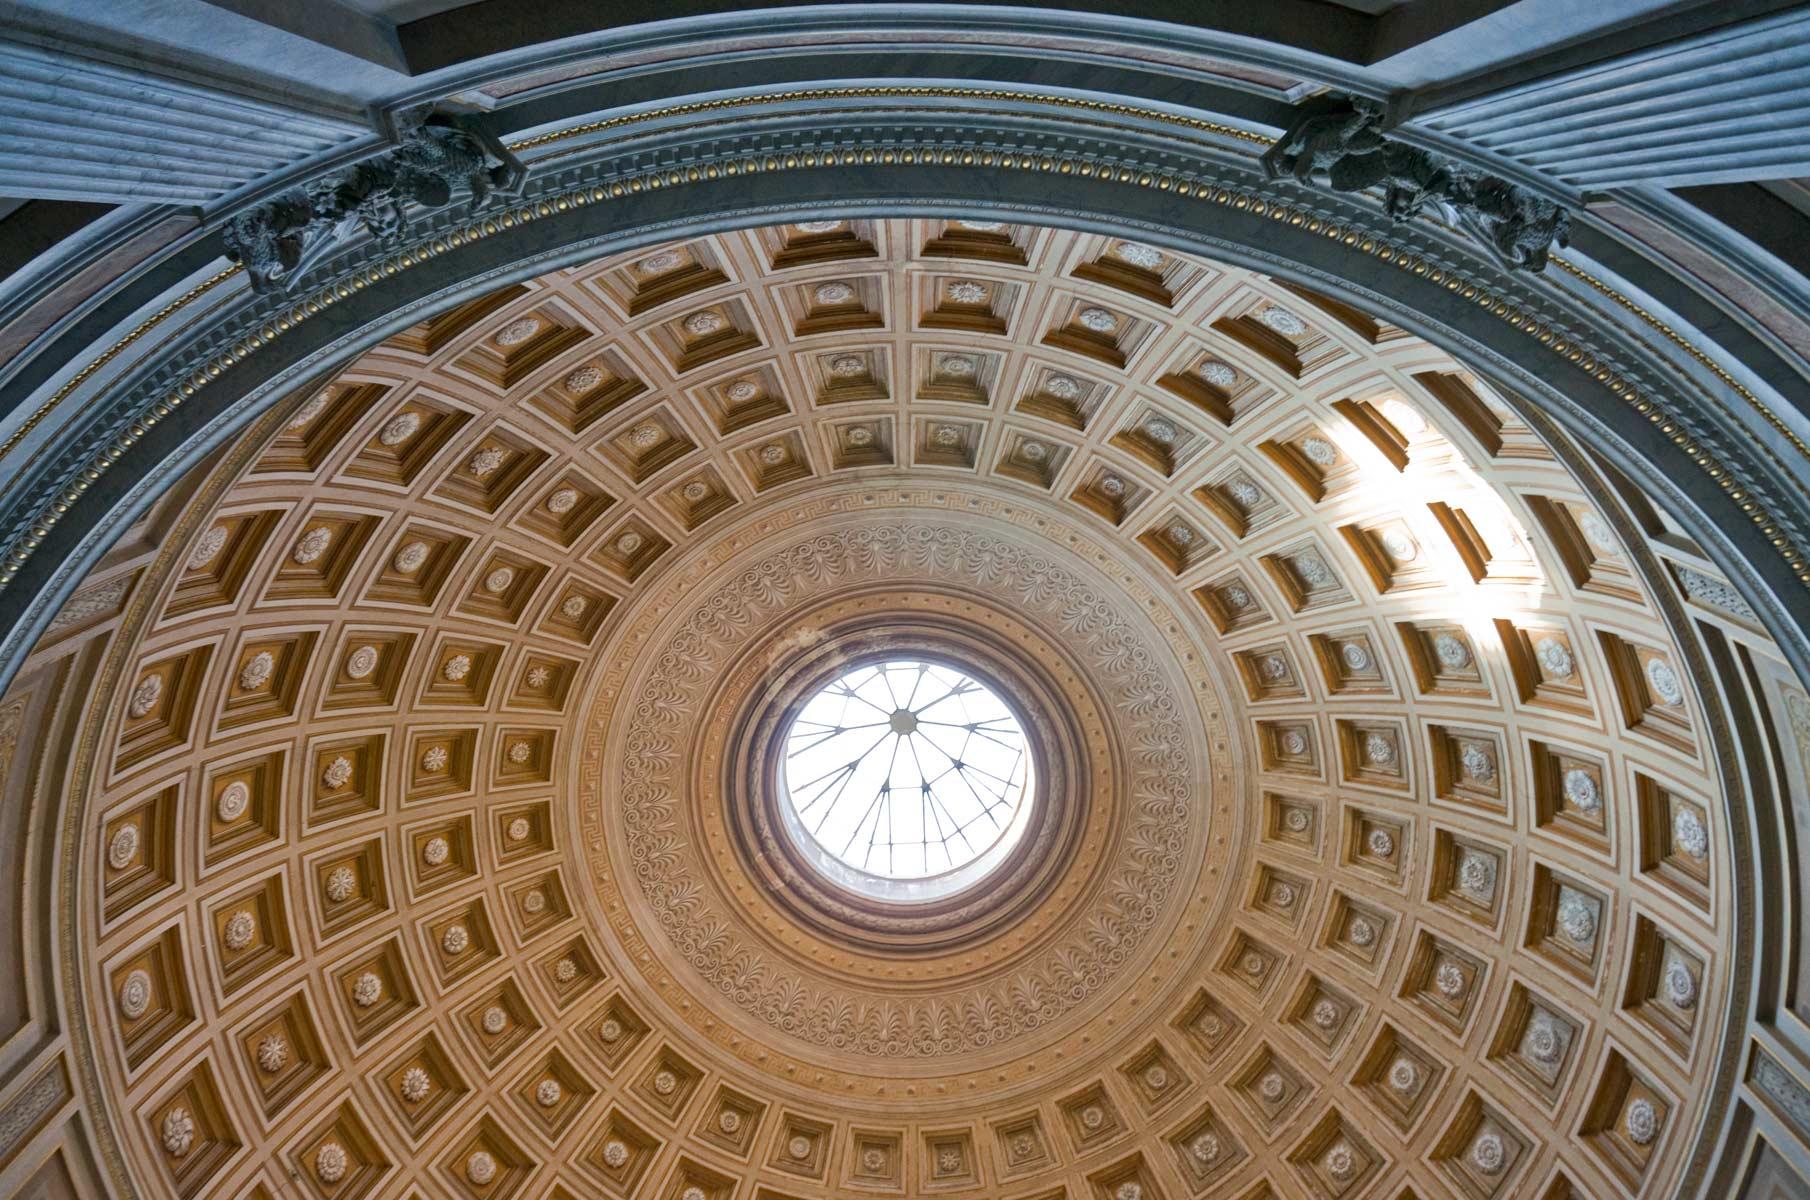 Kuppel im Vatikanischem Museum in Rom, Italien